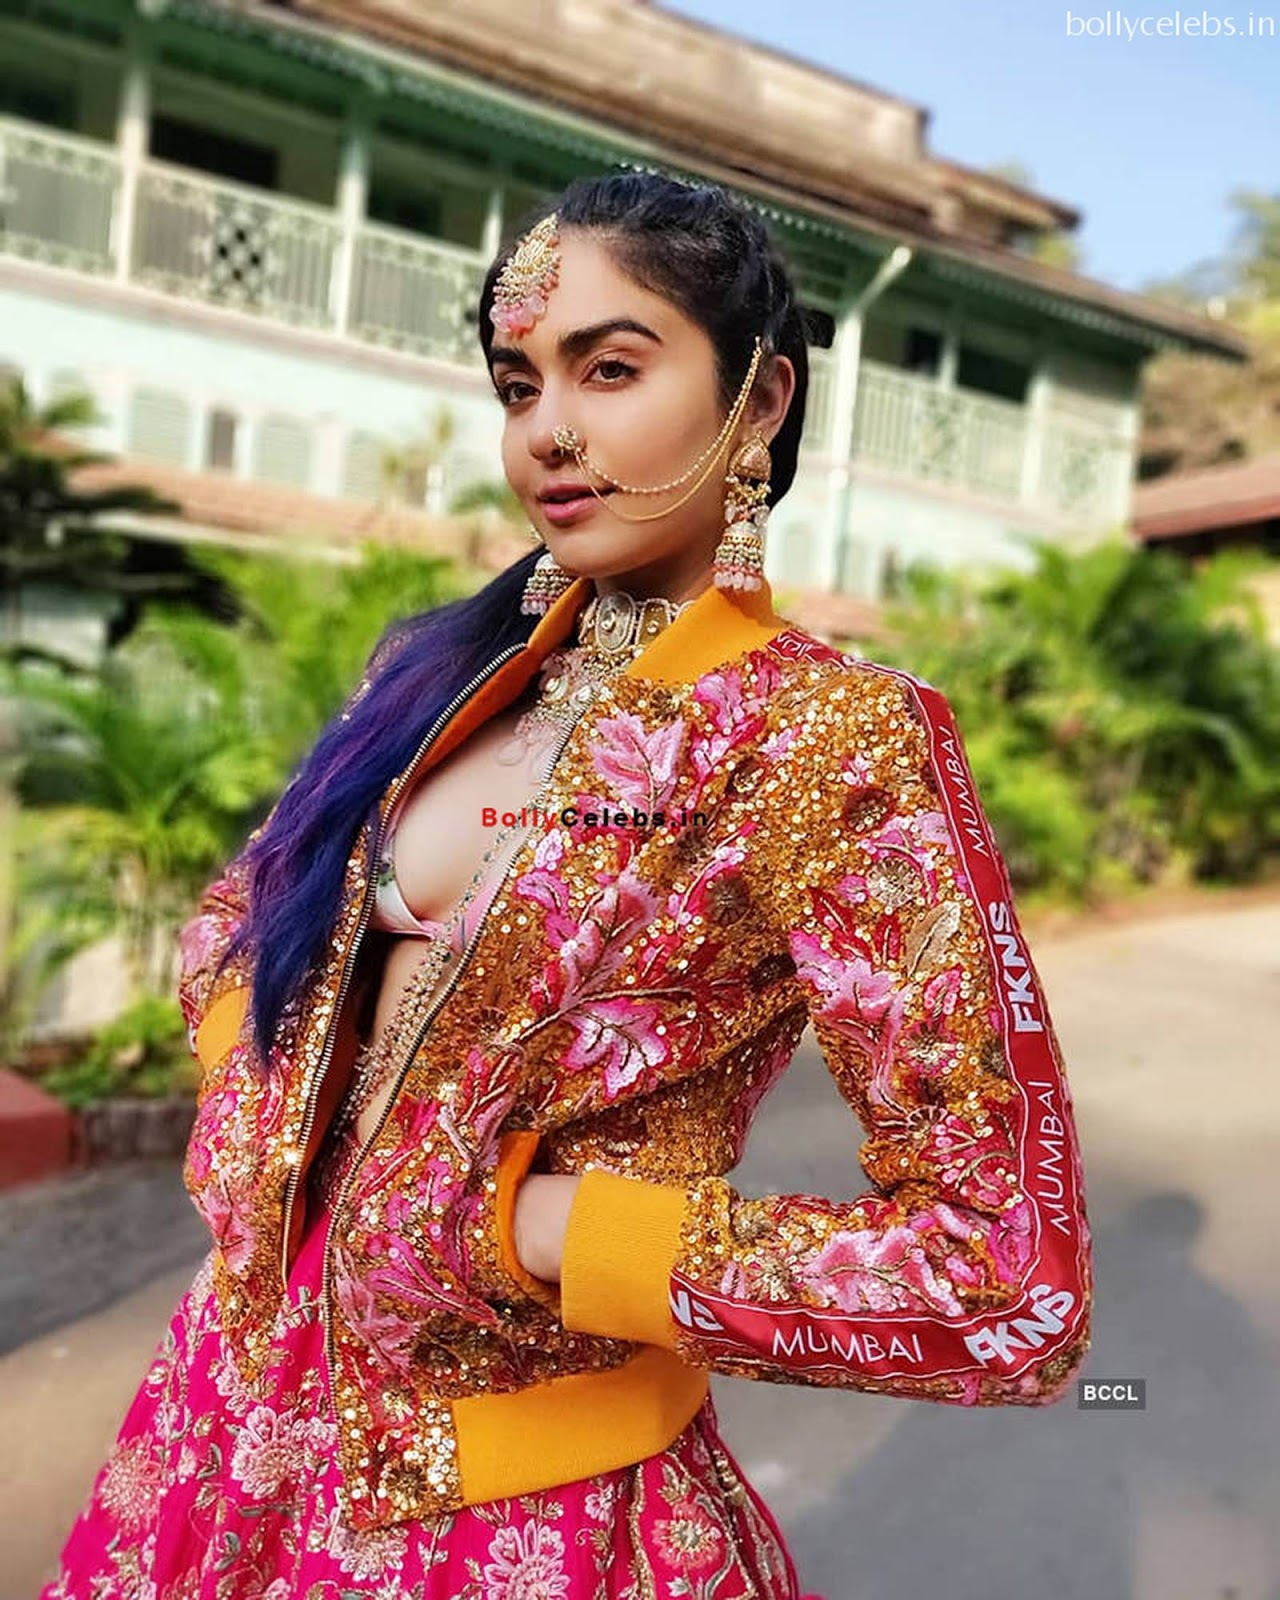 Adah Sharma Stunning Monokini Pics bollycelebs.in Exclusive